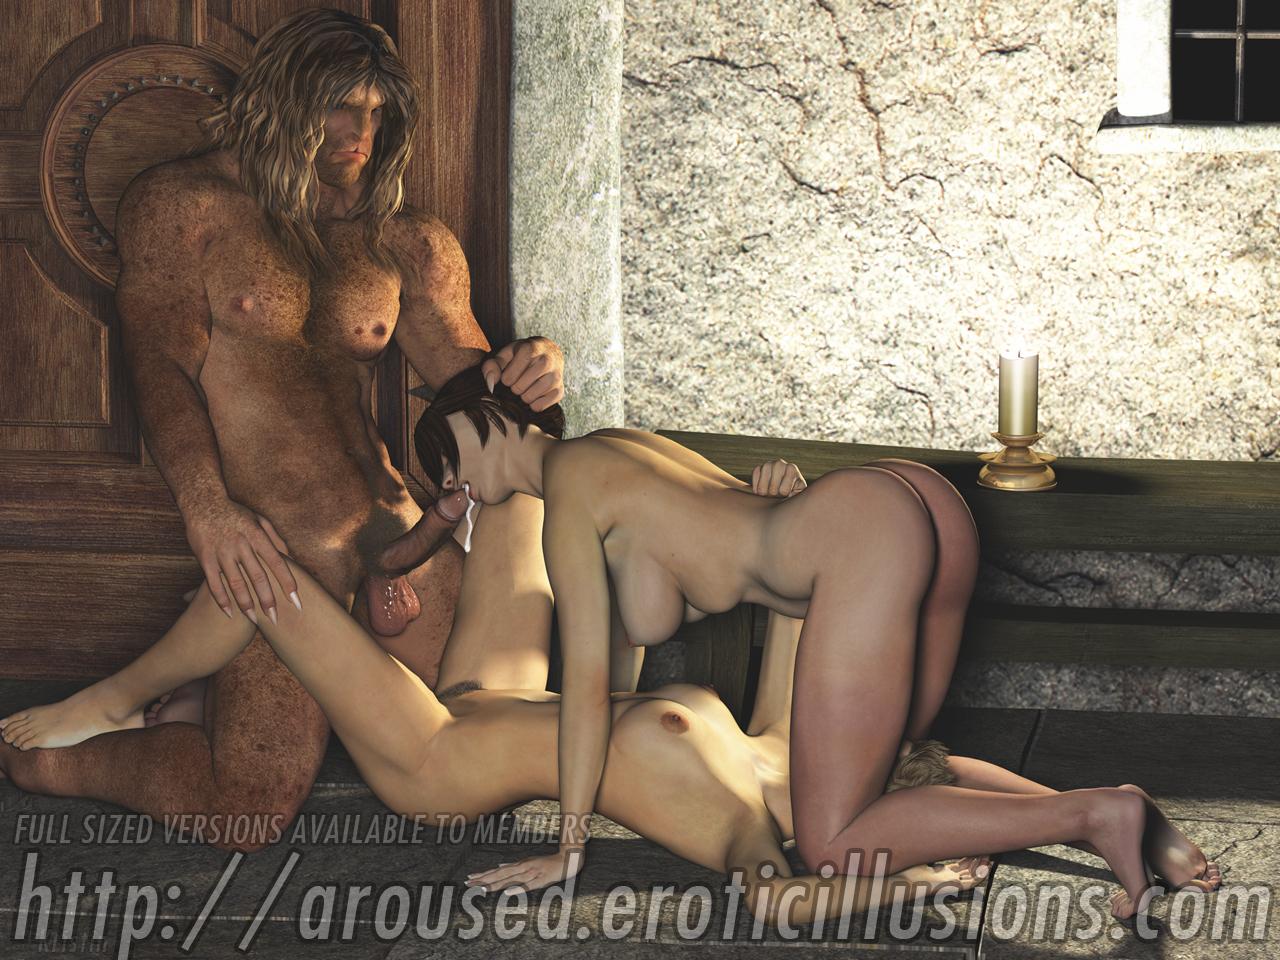 erotic fiction forum